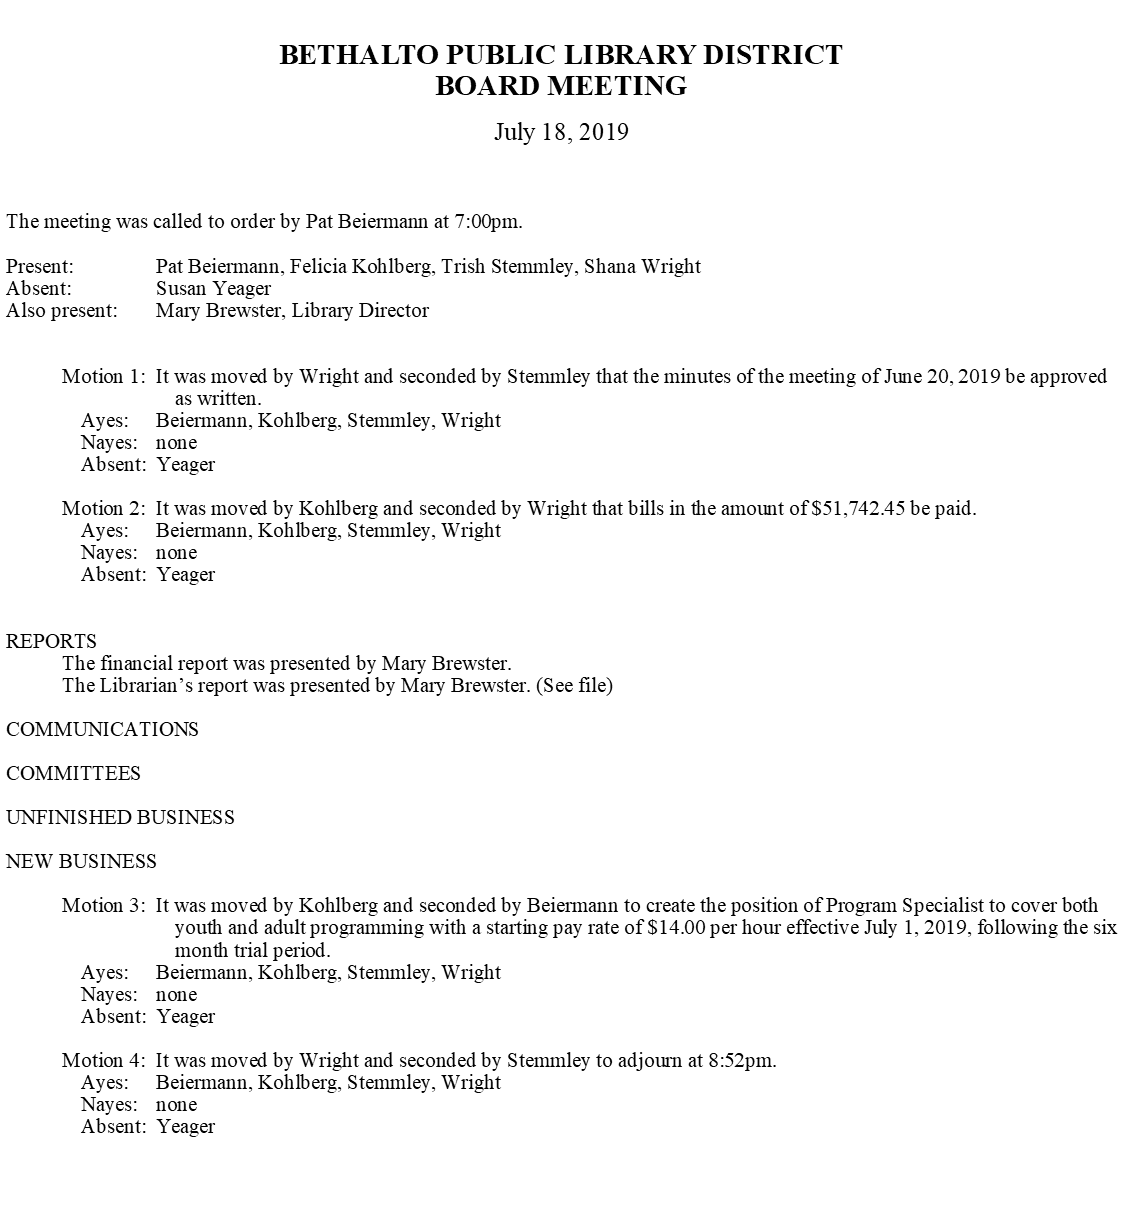 July 18, 2019 Board Minutes